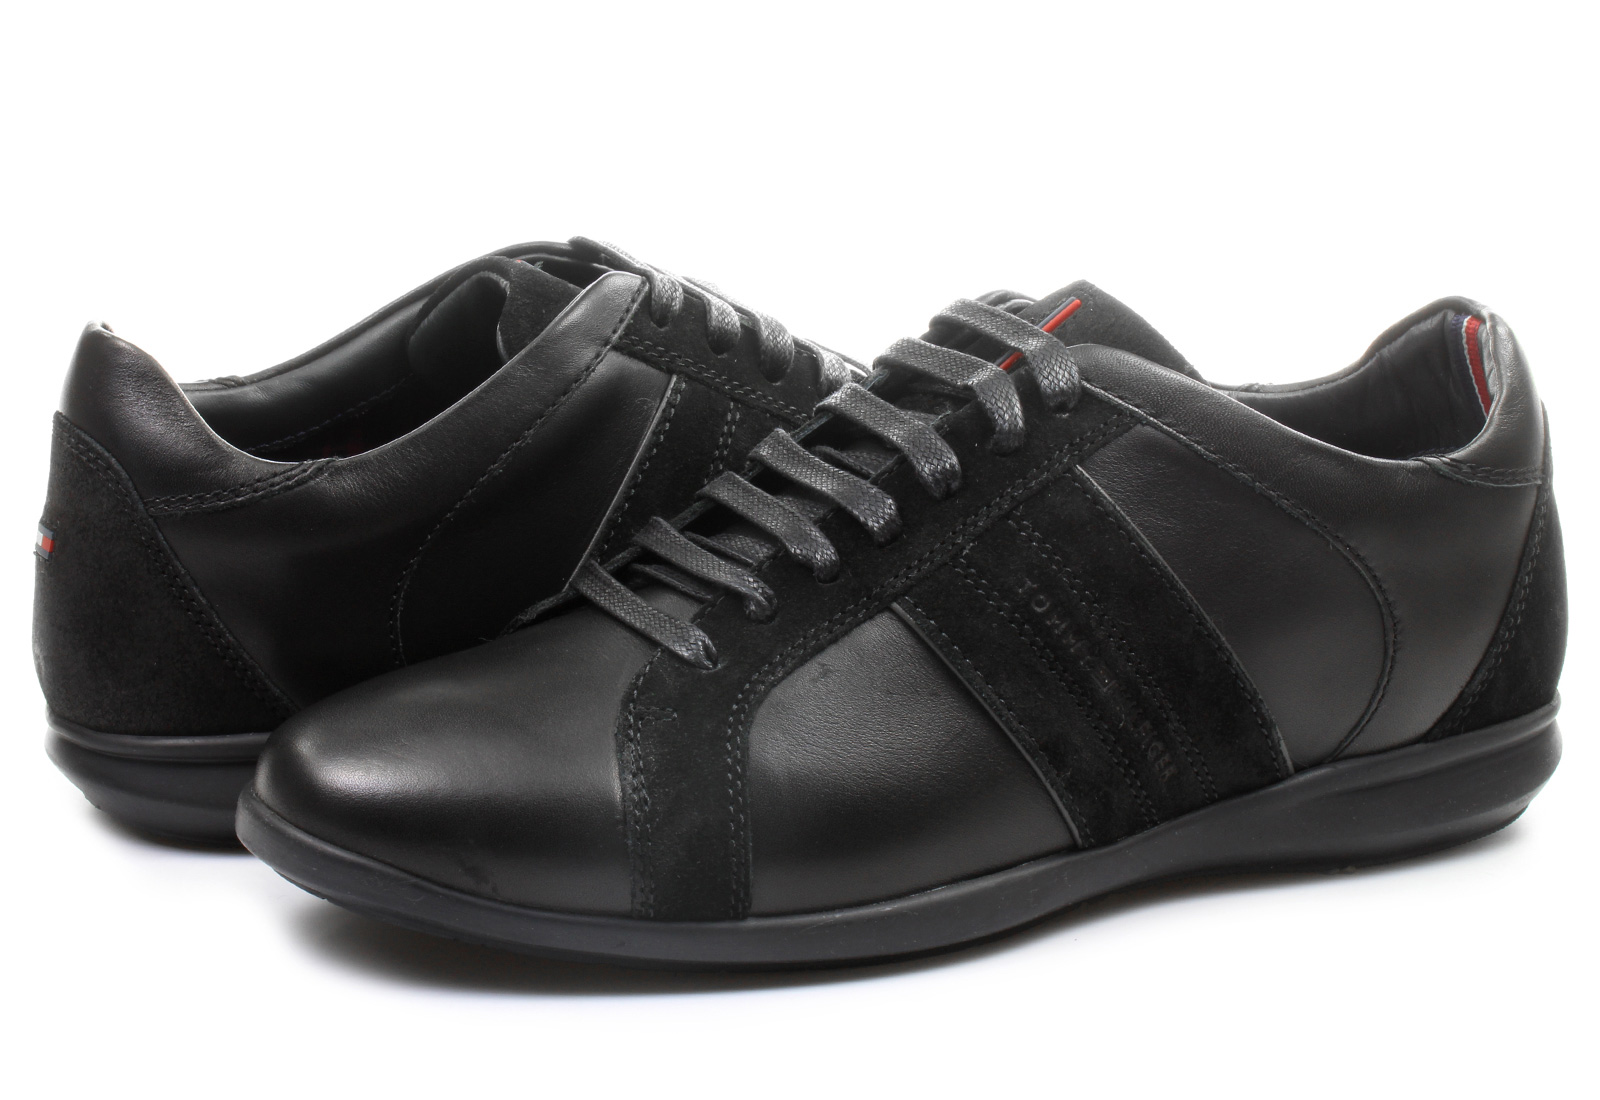 a339f0a50 Tommy Hilfiger Shoes - Oliver 12c - 14f-7911-990 - Online shop for ...